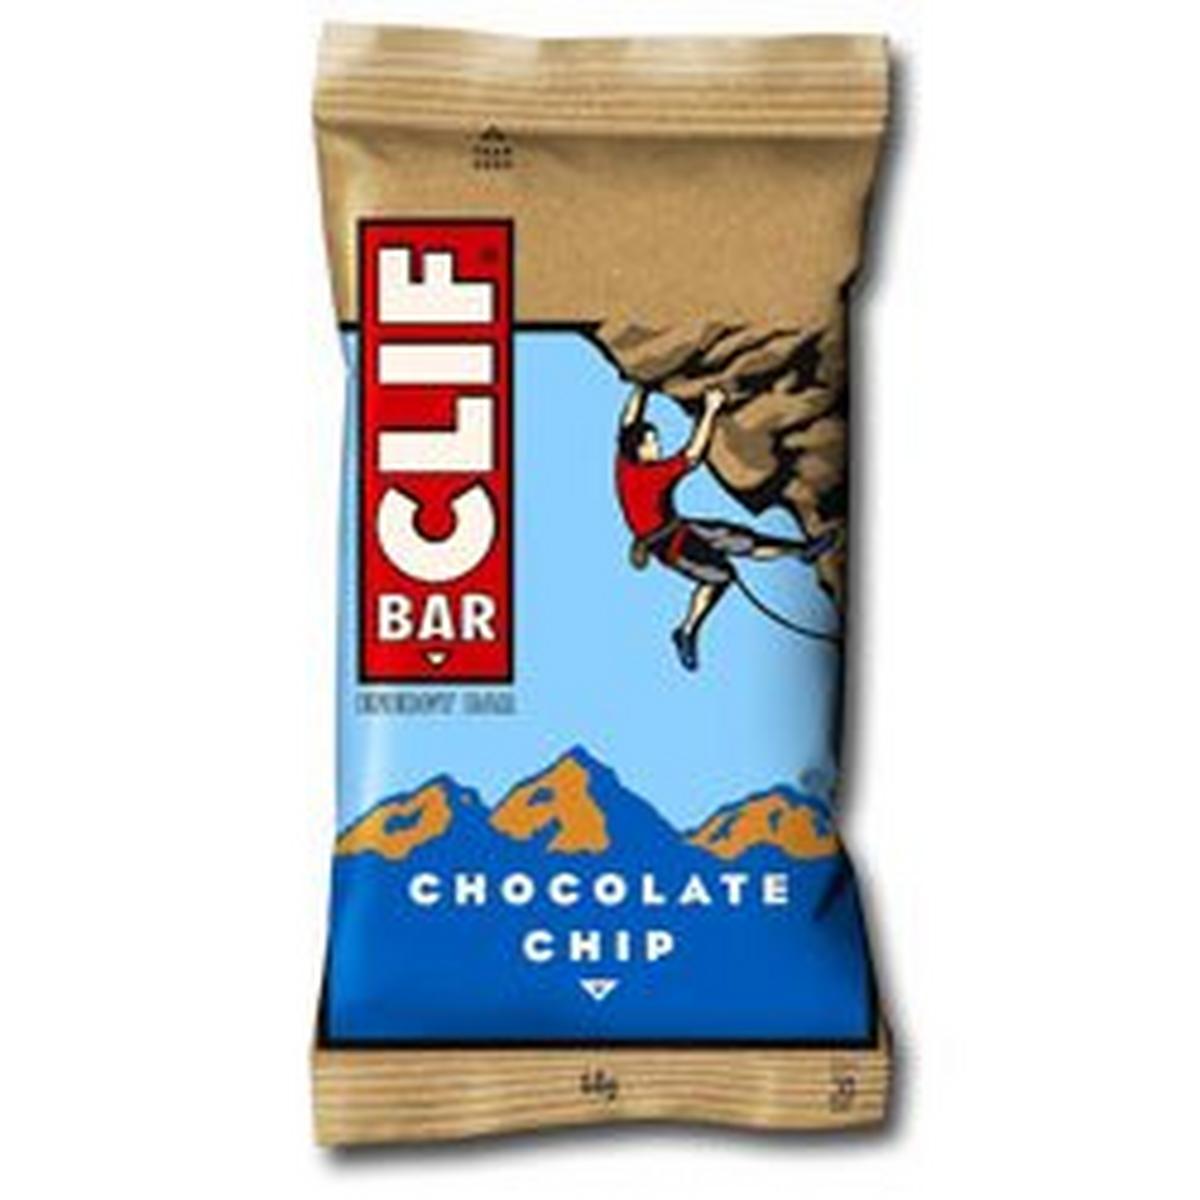 Cliff Clif Bar - Choc Chip